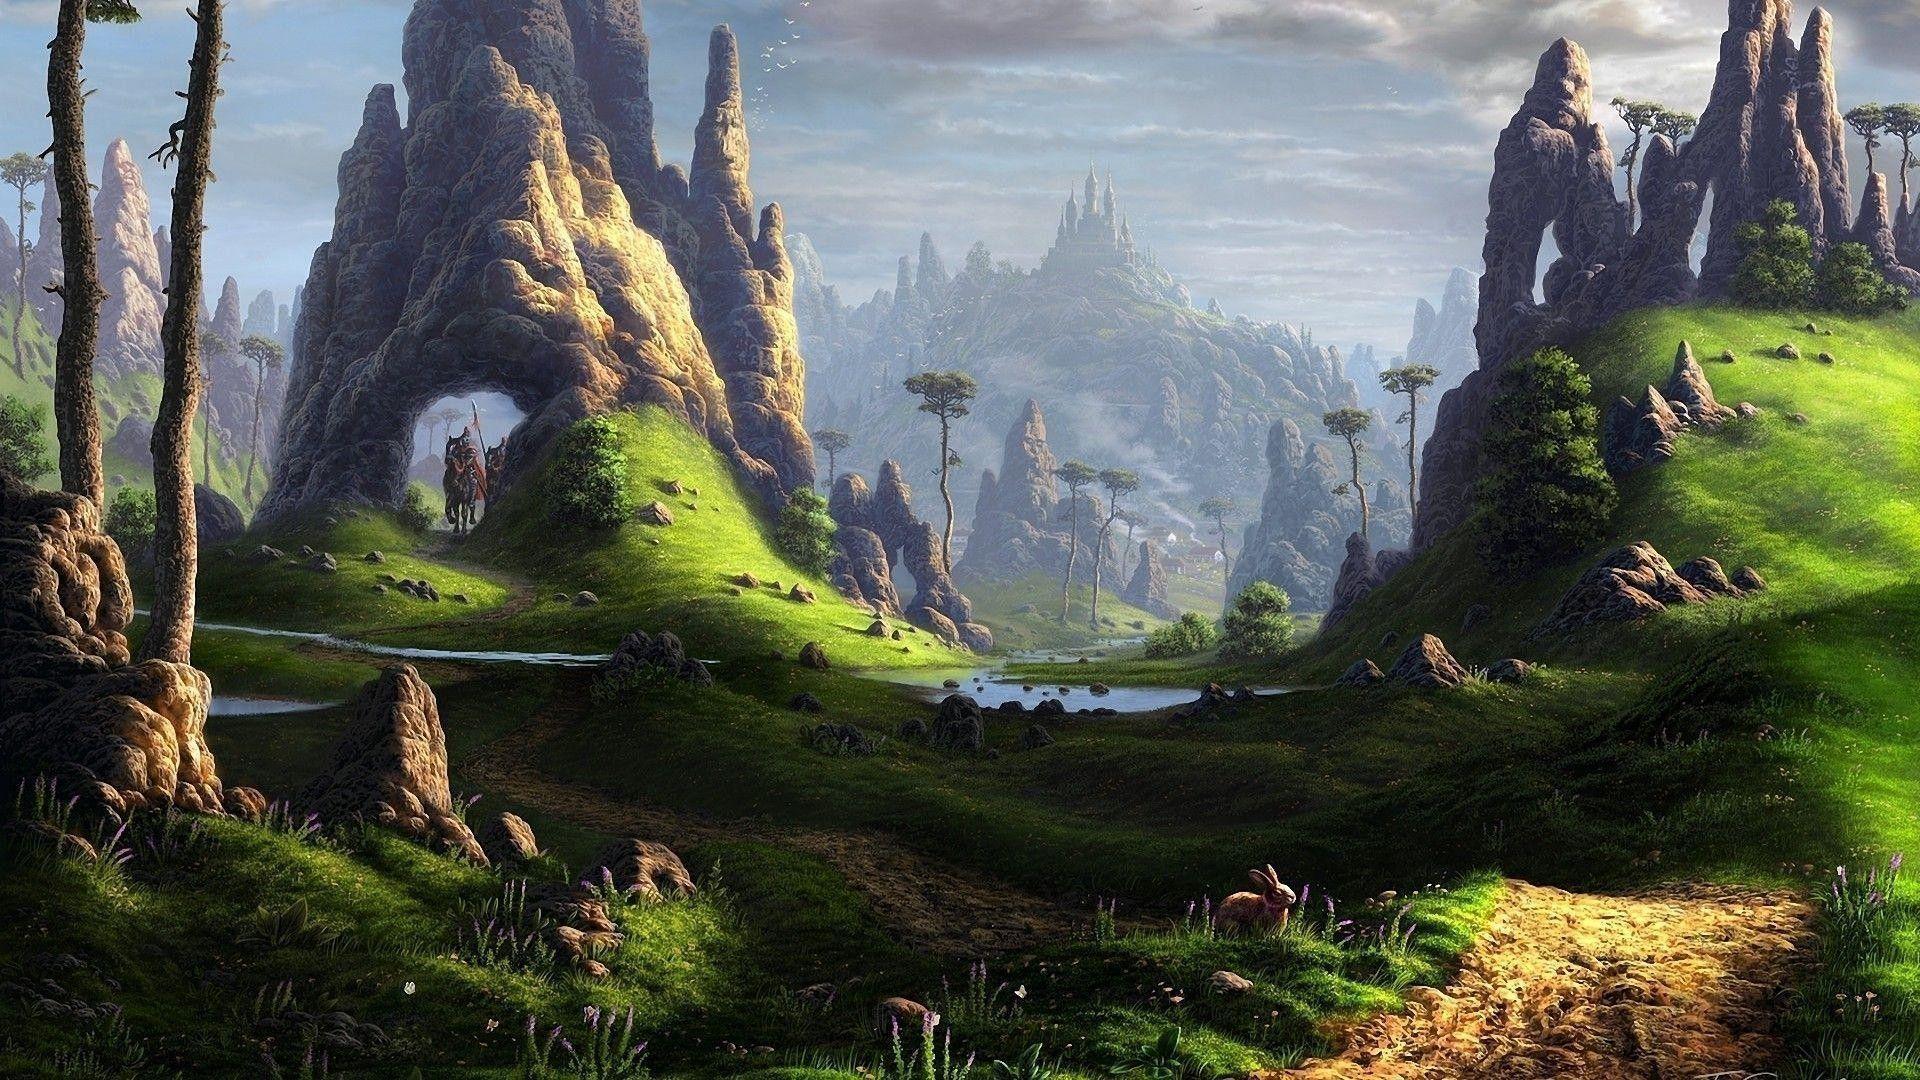 Fantasy Landscape Wallpapers Top Free Fantasy Landscape Backgrounds Wallpaperaccess